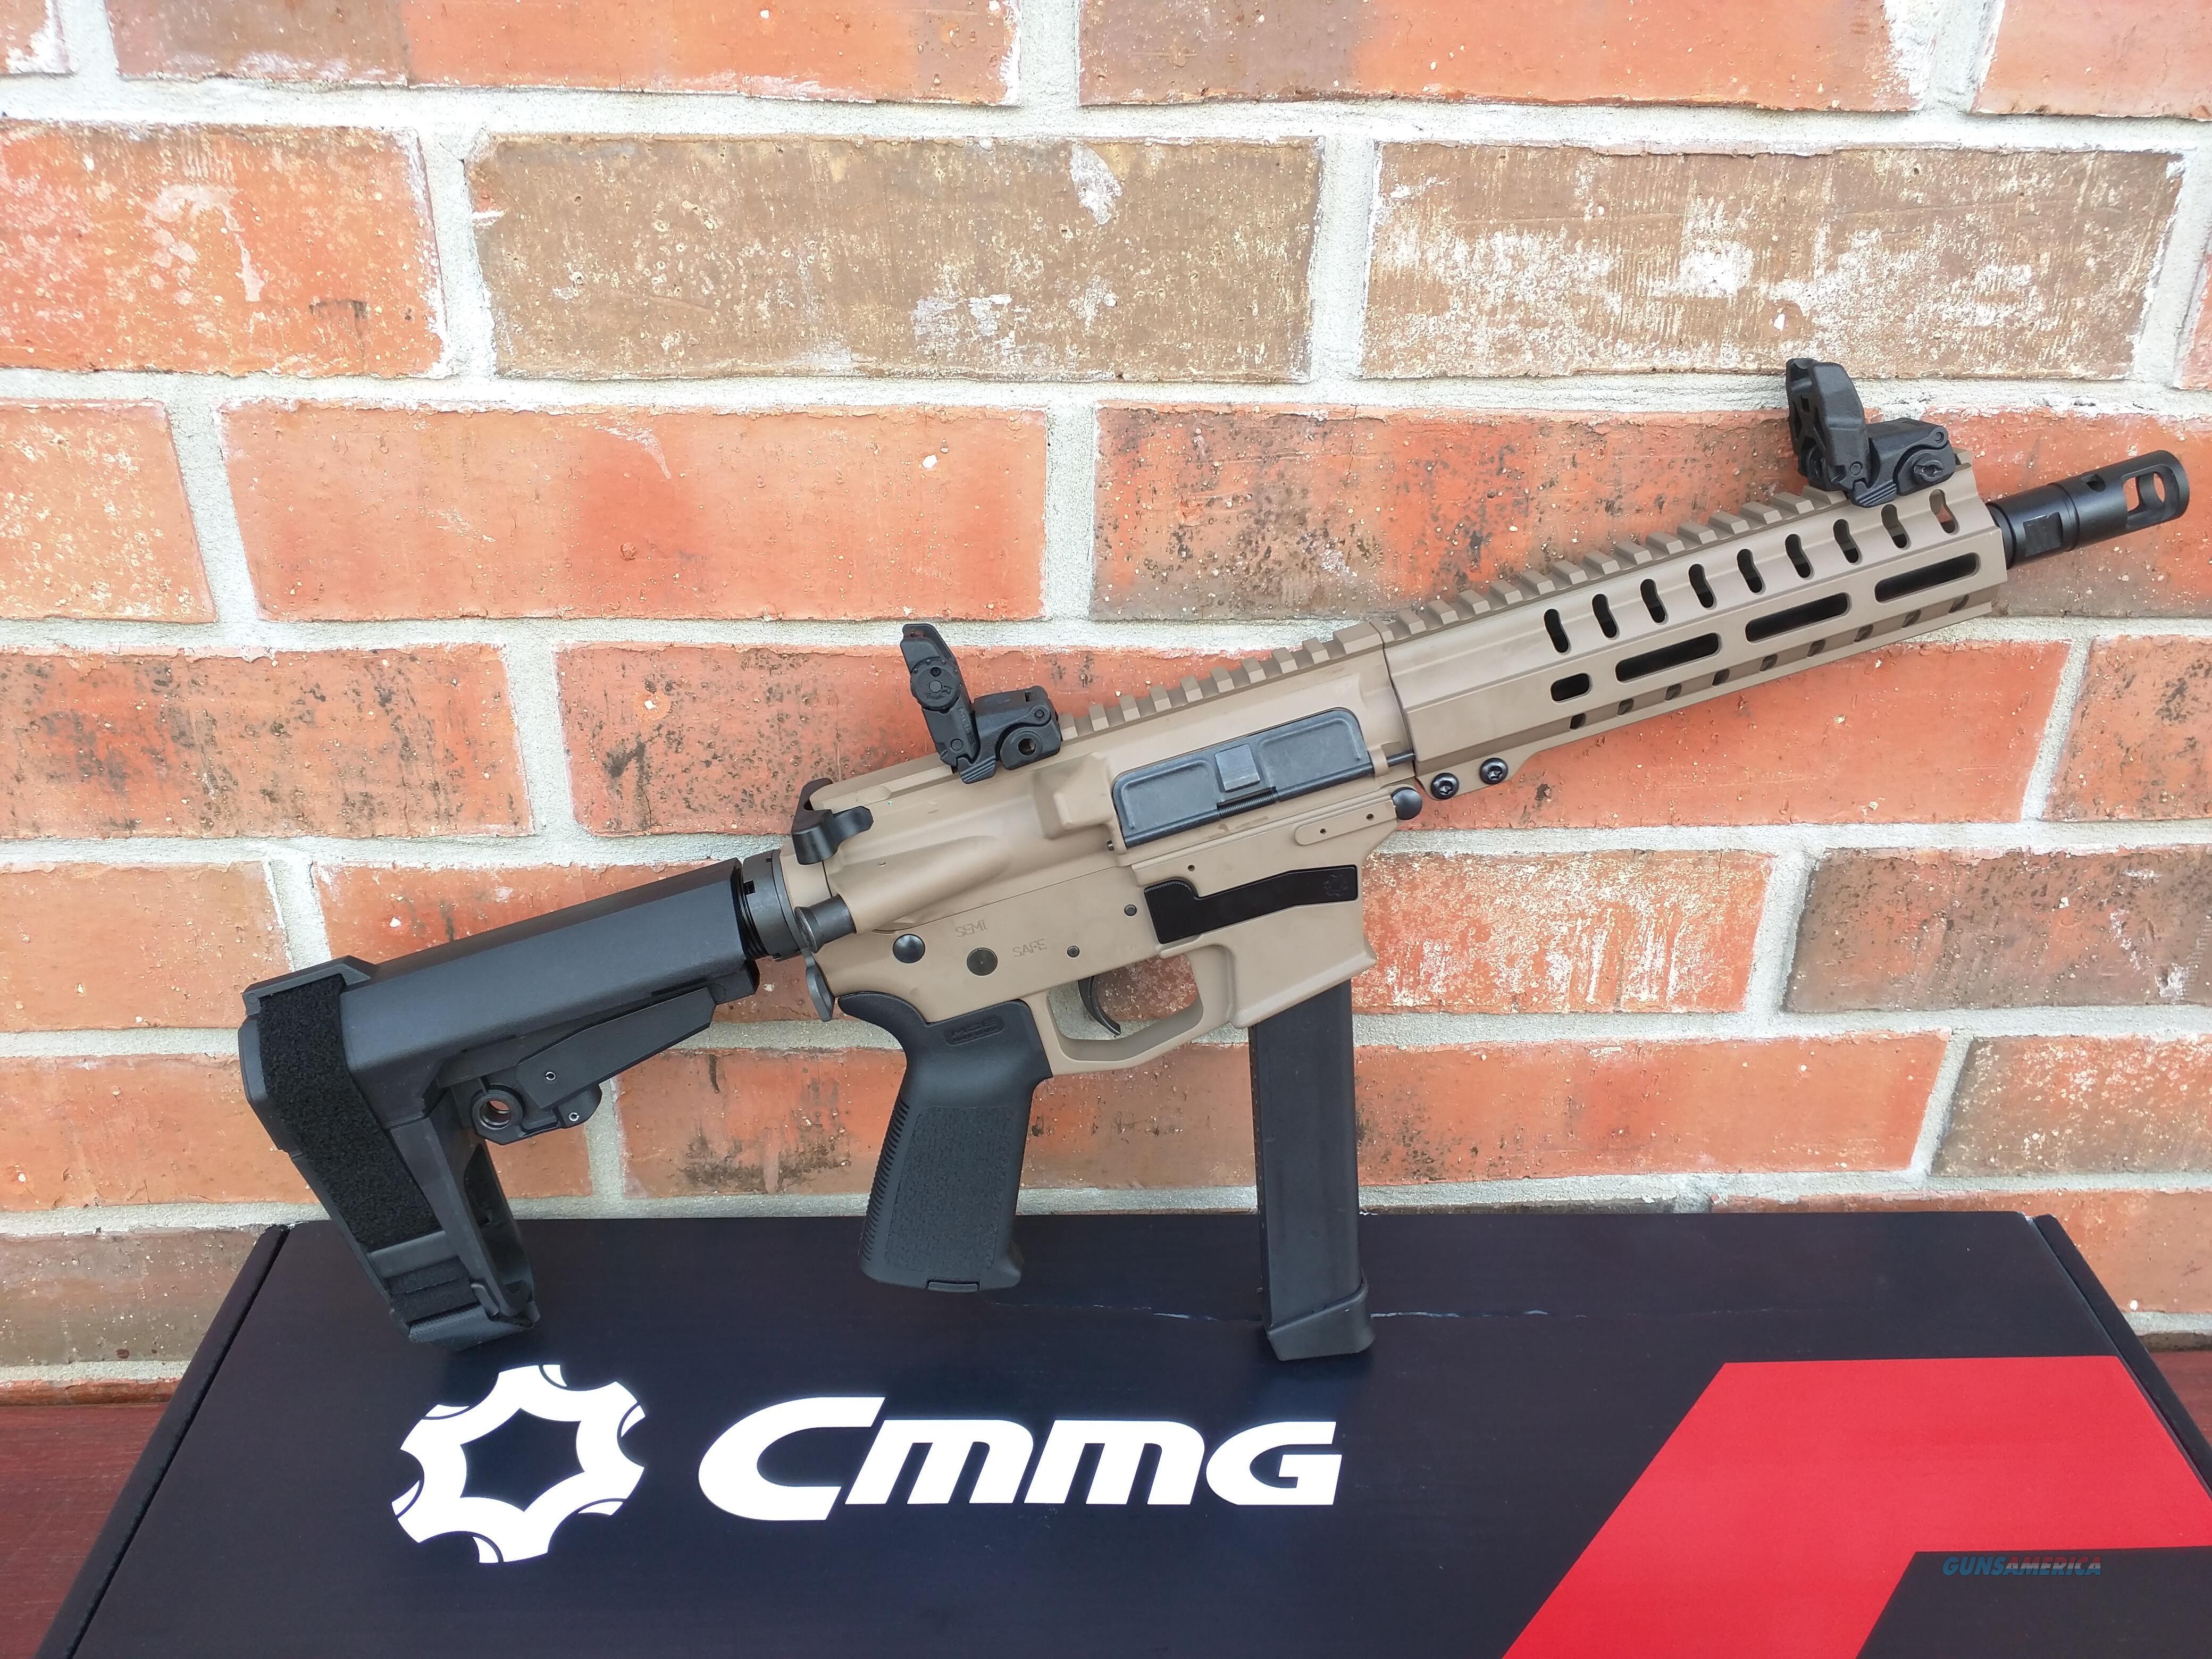 "CMMG Banshee AR 15 Pistol 9mm Flat Dark Earth 8"" FREE MAGPUL MBUS FLIP UP SIGHTS, SBA3 Pistol Brace ,33 Rd Magazine Takes Glock Mags RADIAL DELAYED BLOWBACK Billet Alum. NIB, FREE LAYAWAY  Guns > Rifles > CMMG > CMMG Rifle"